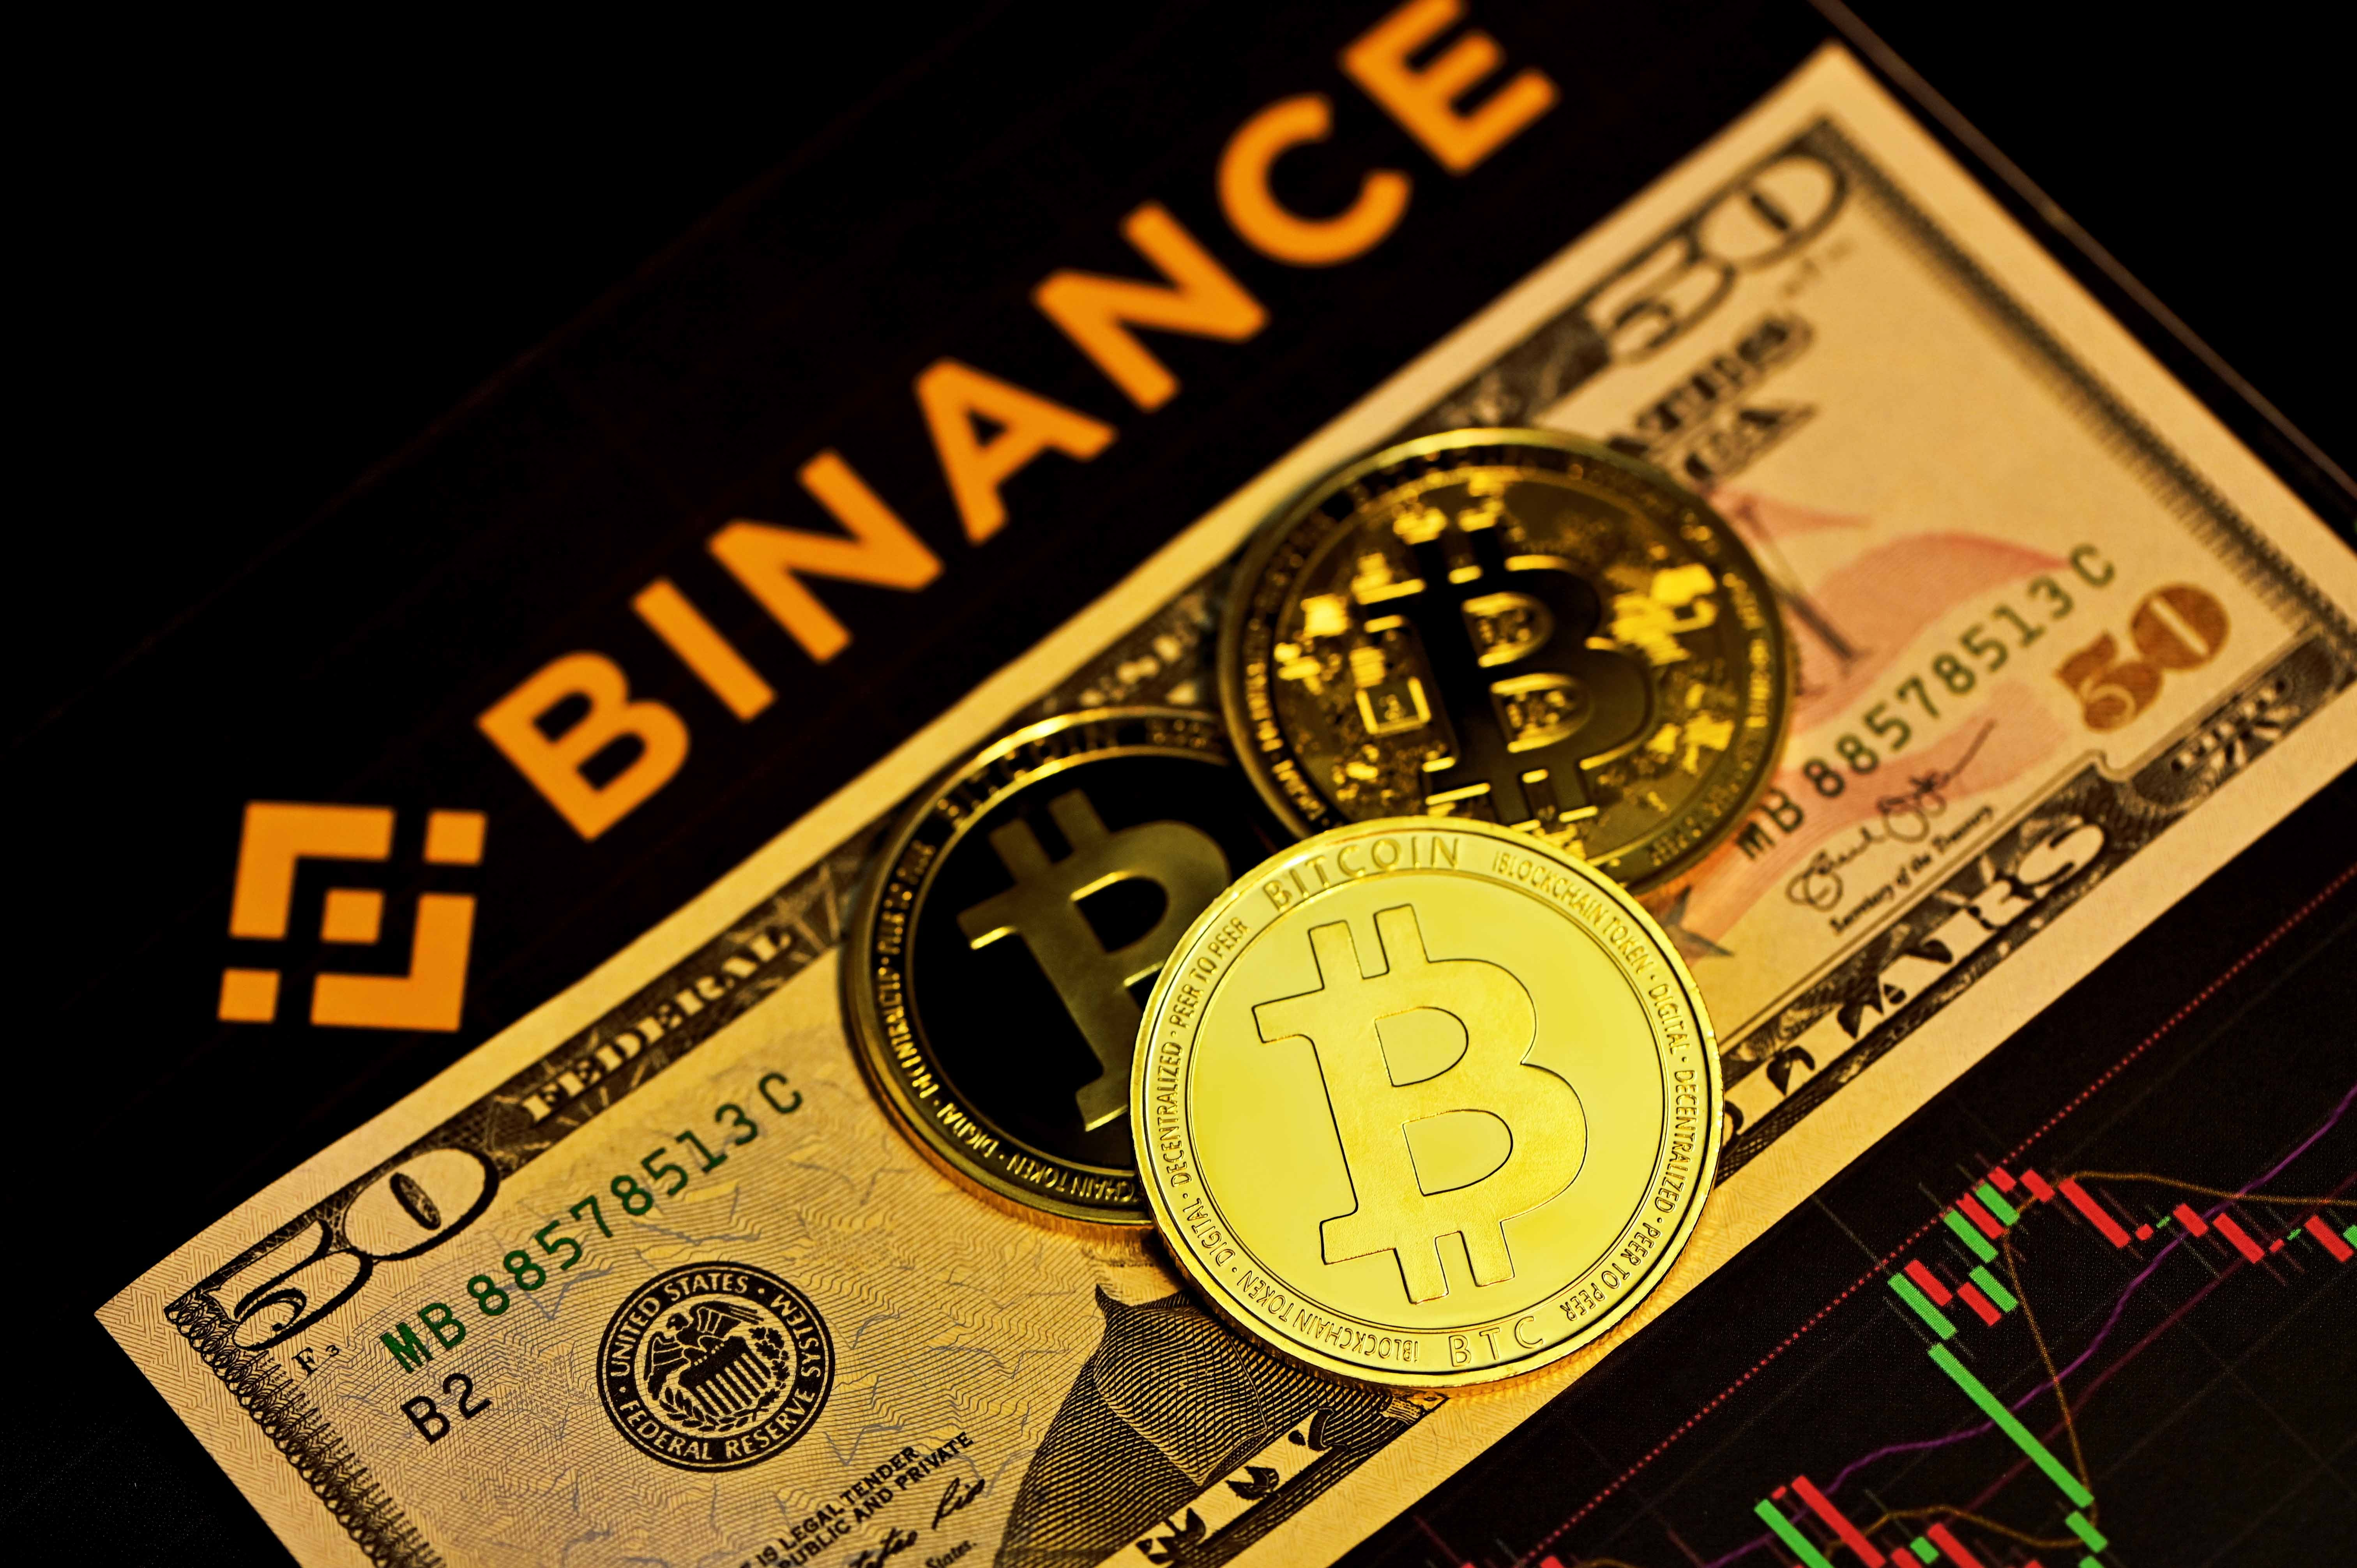 Crypto Exchange Binance Ceases Hong Kong Futures As Regulatory Pressure Piles Up